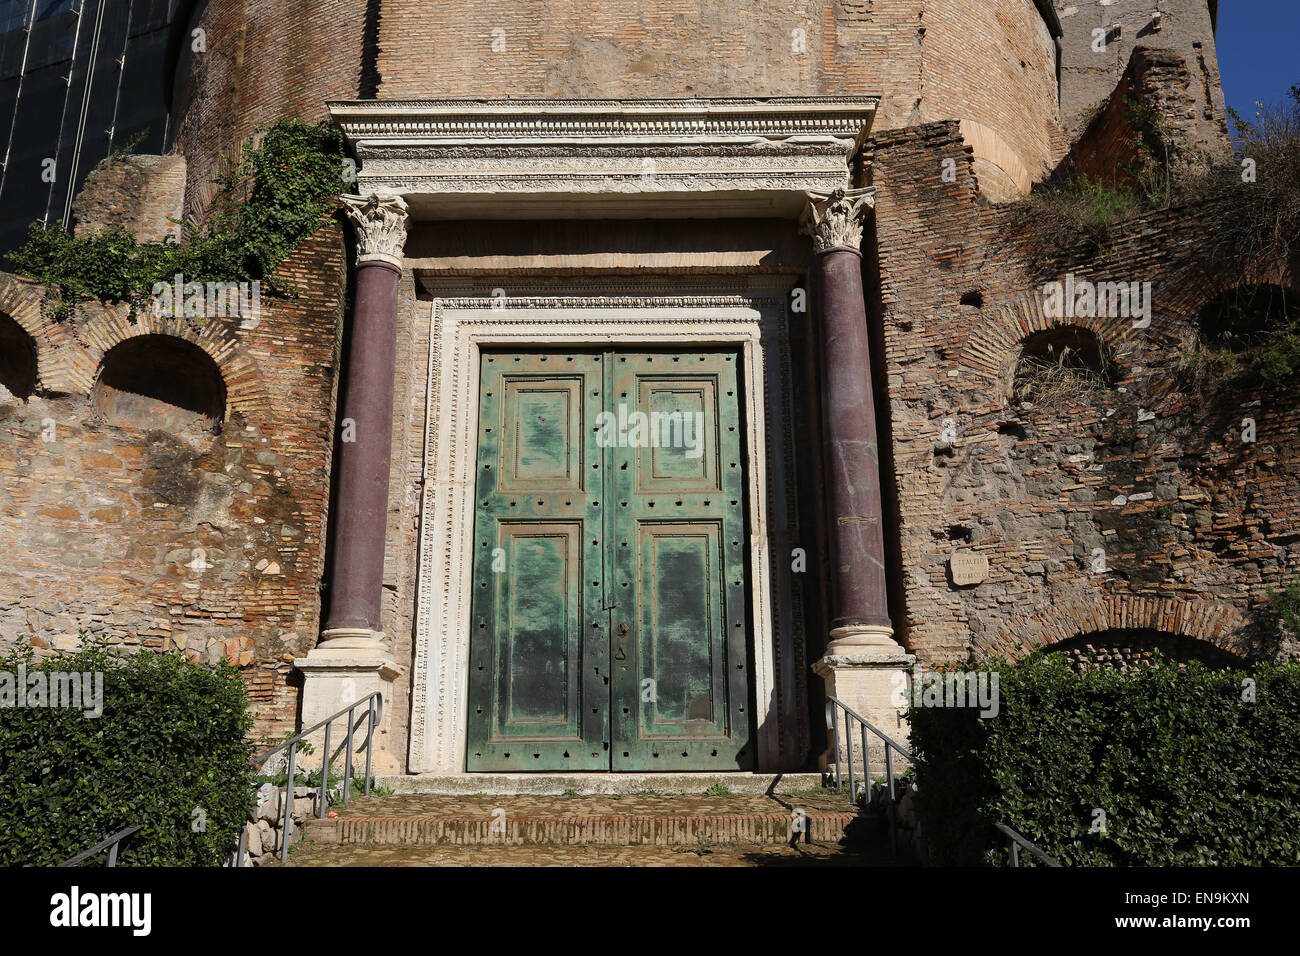 Italy. Rome. Roman Forum. Temple Of Divus Romulus. Origal Bronze Doors At